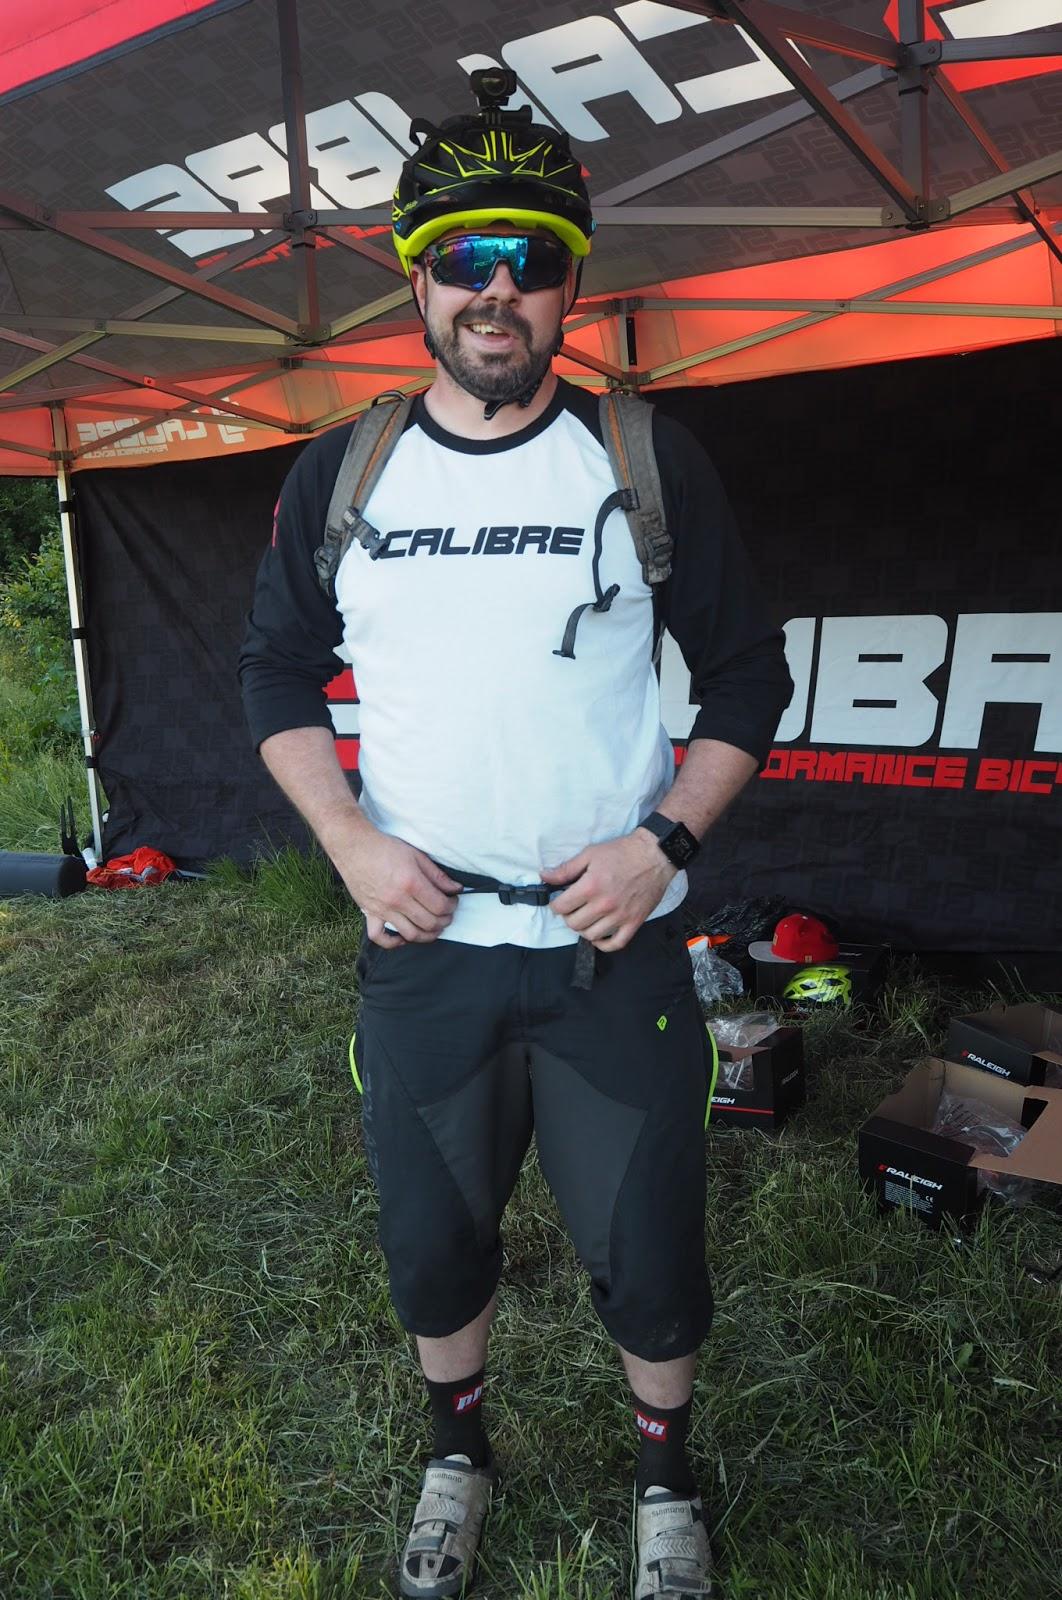 Mike Sanderson GO outdoors bike specialist